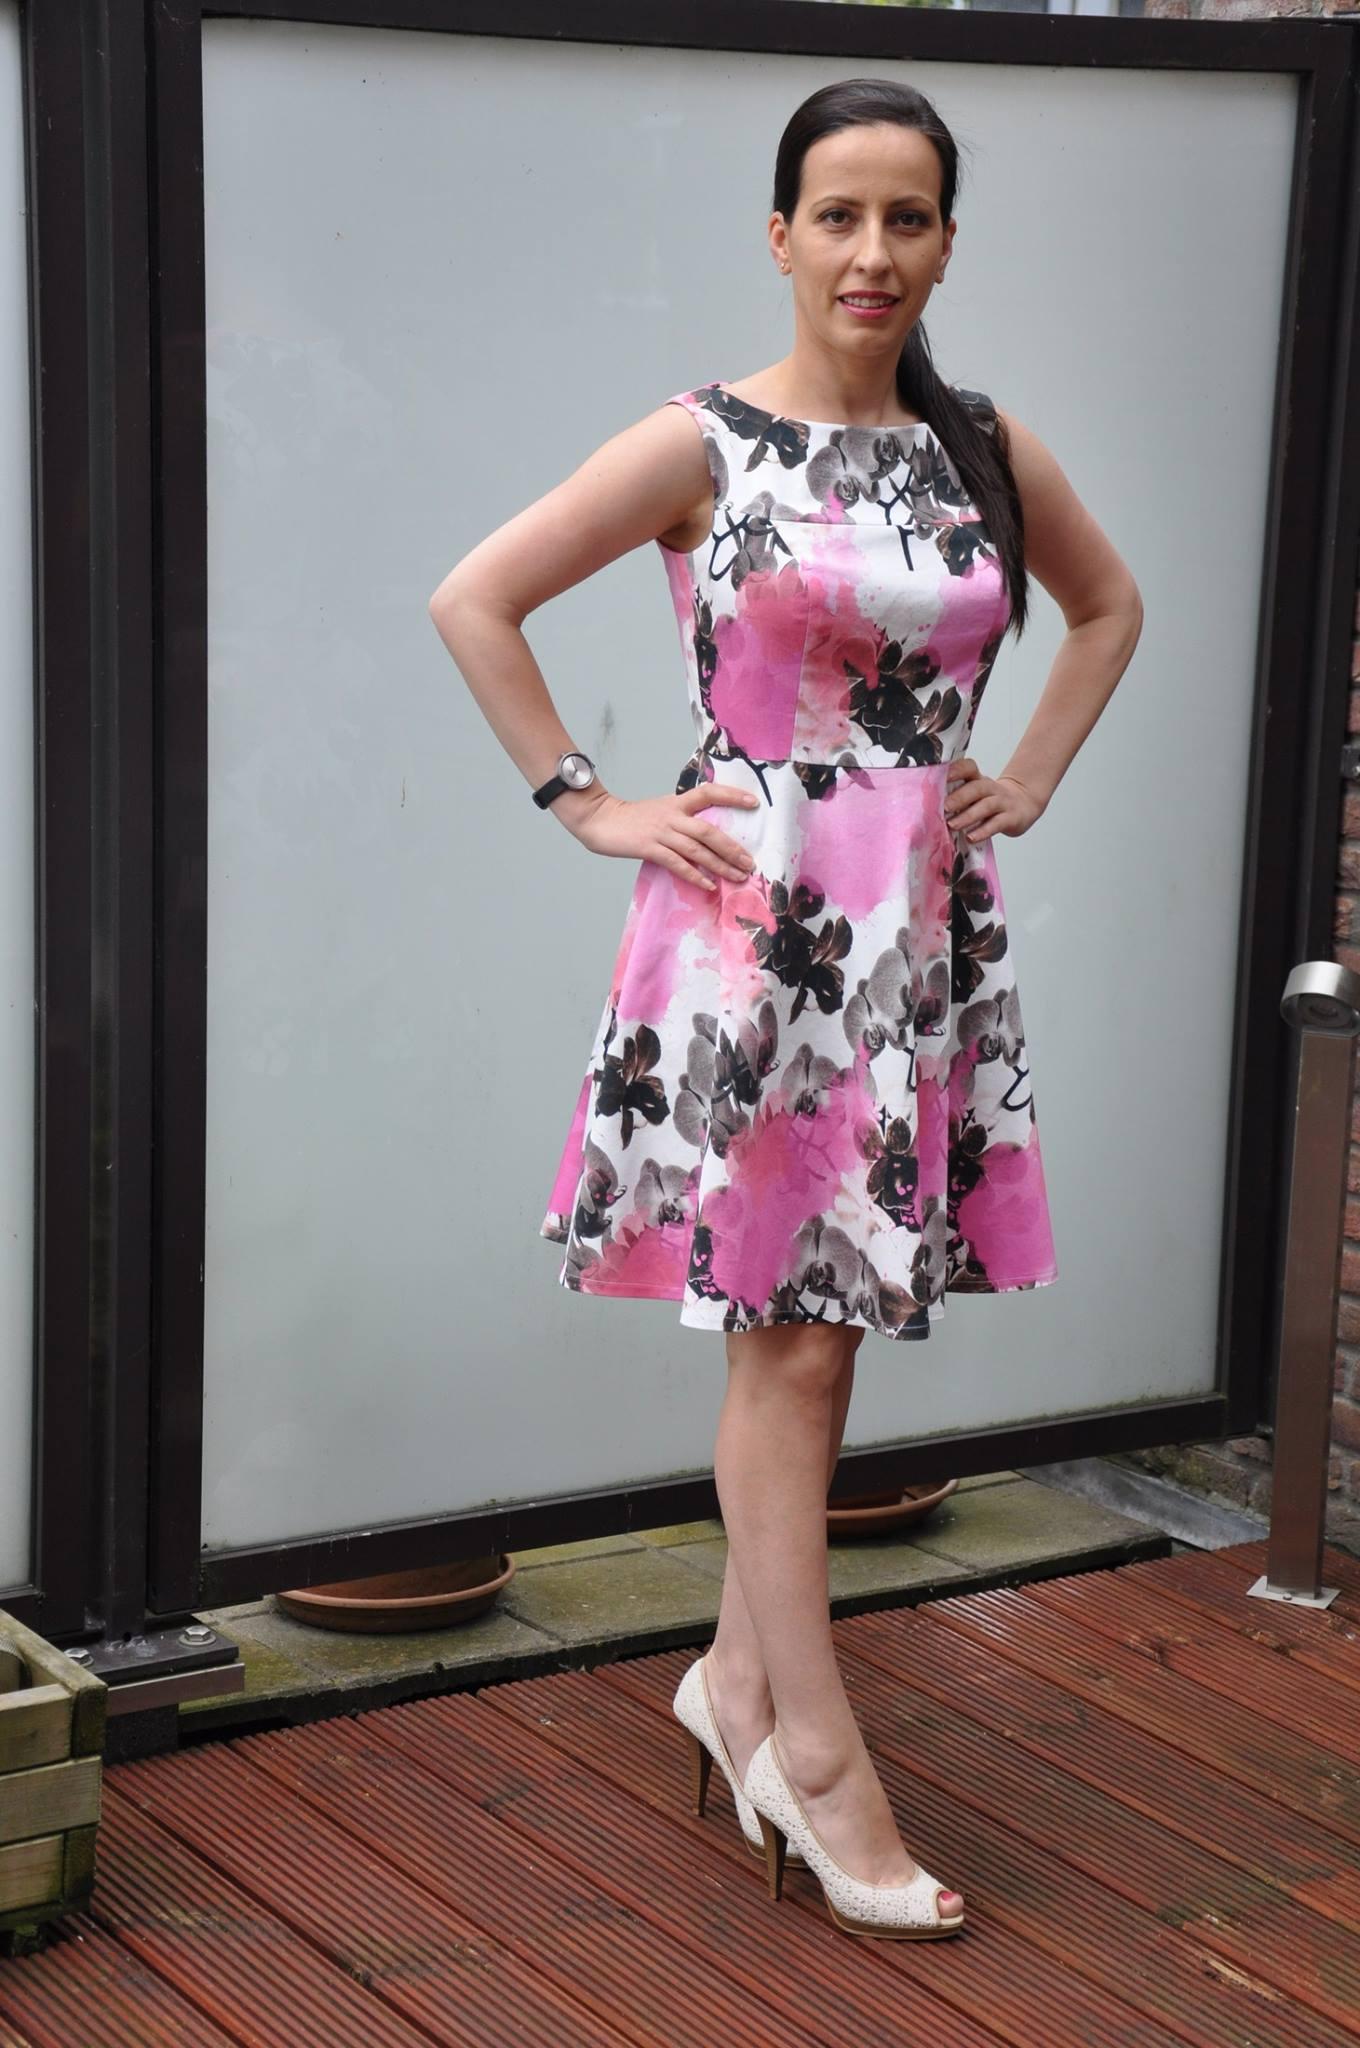 Marbella Dress Half-circle Skirt Add-on Tester Photo